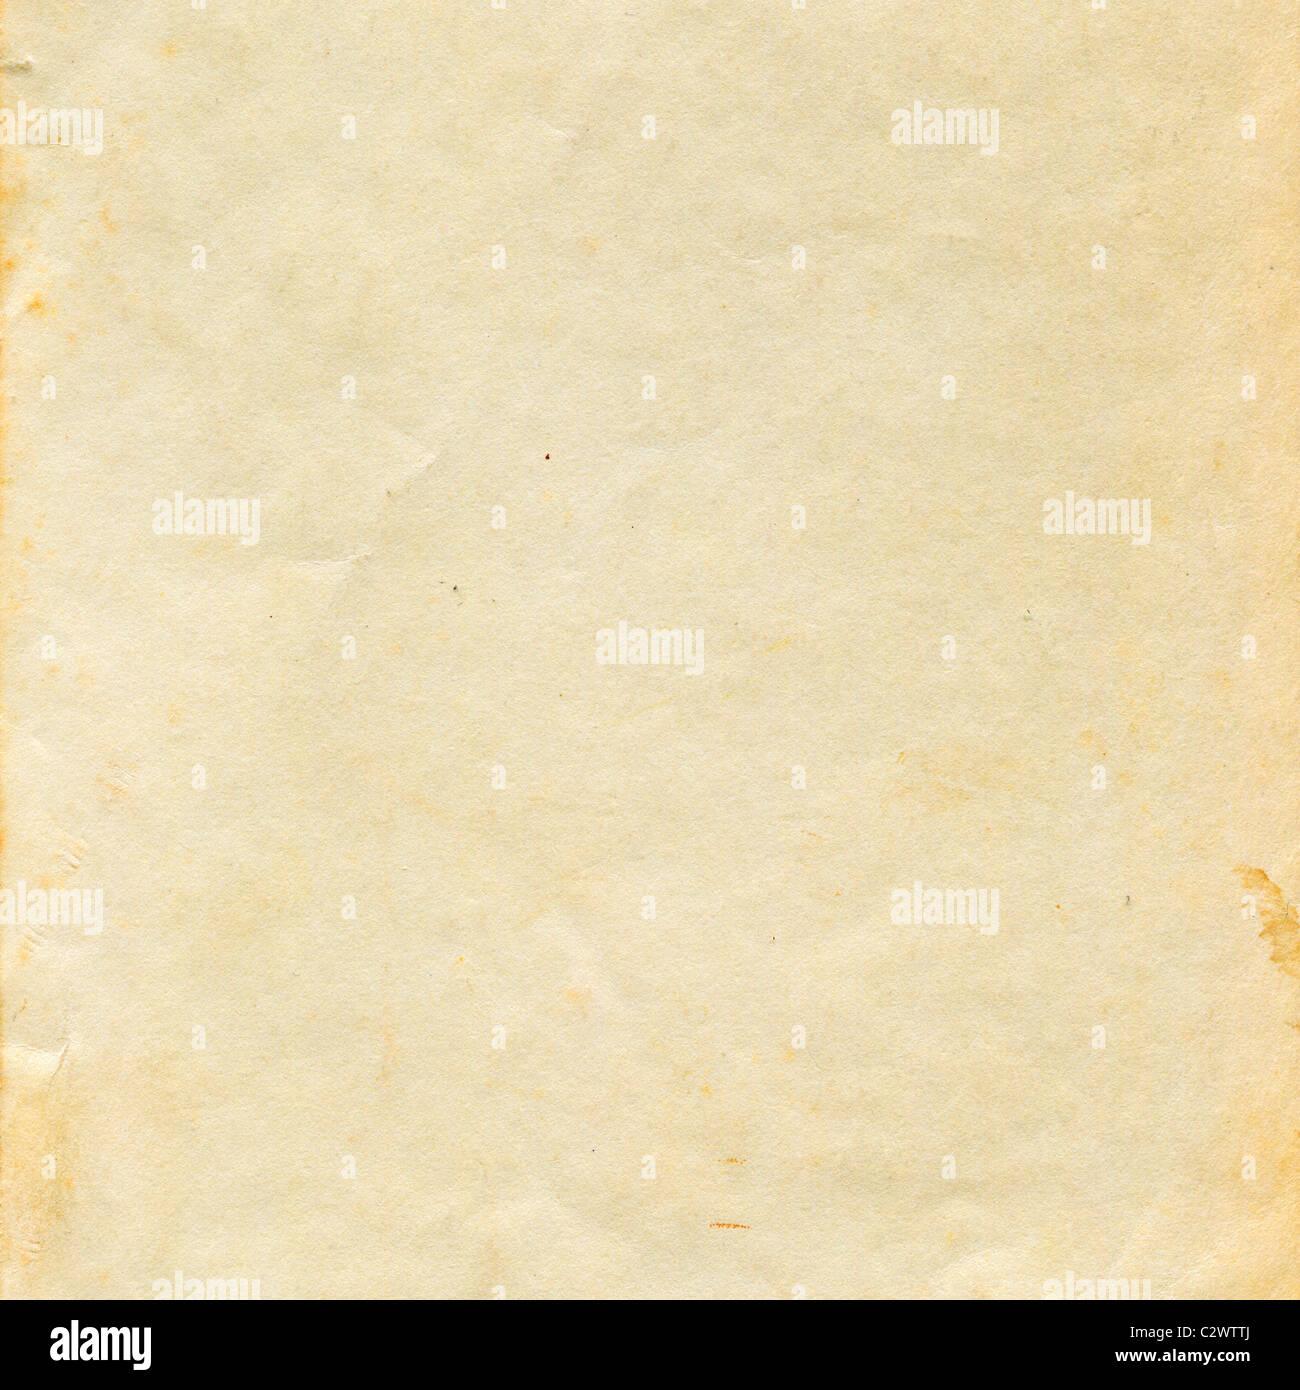 La textura de la superficie del papel viejo Imagen De Stock